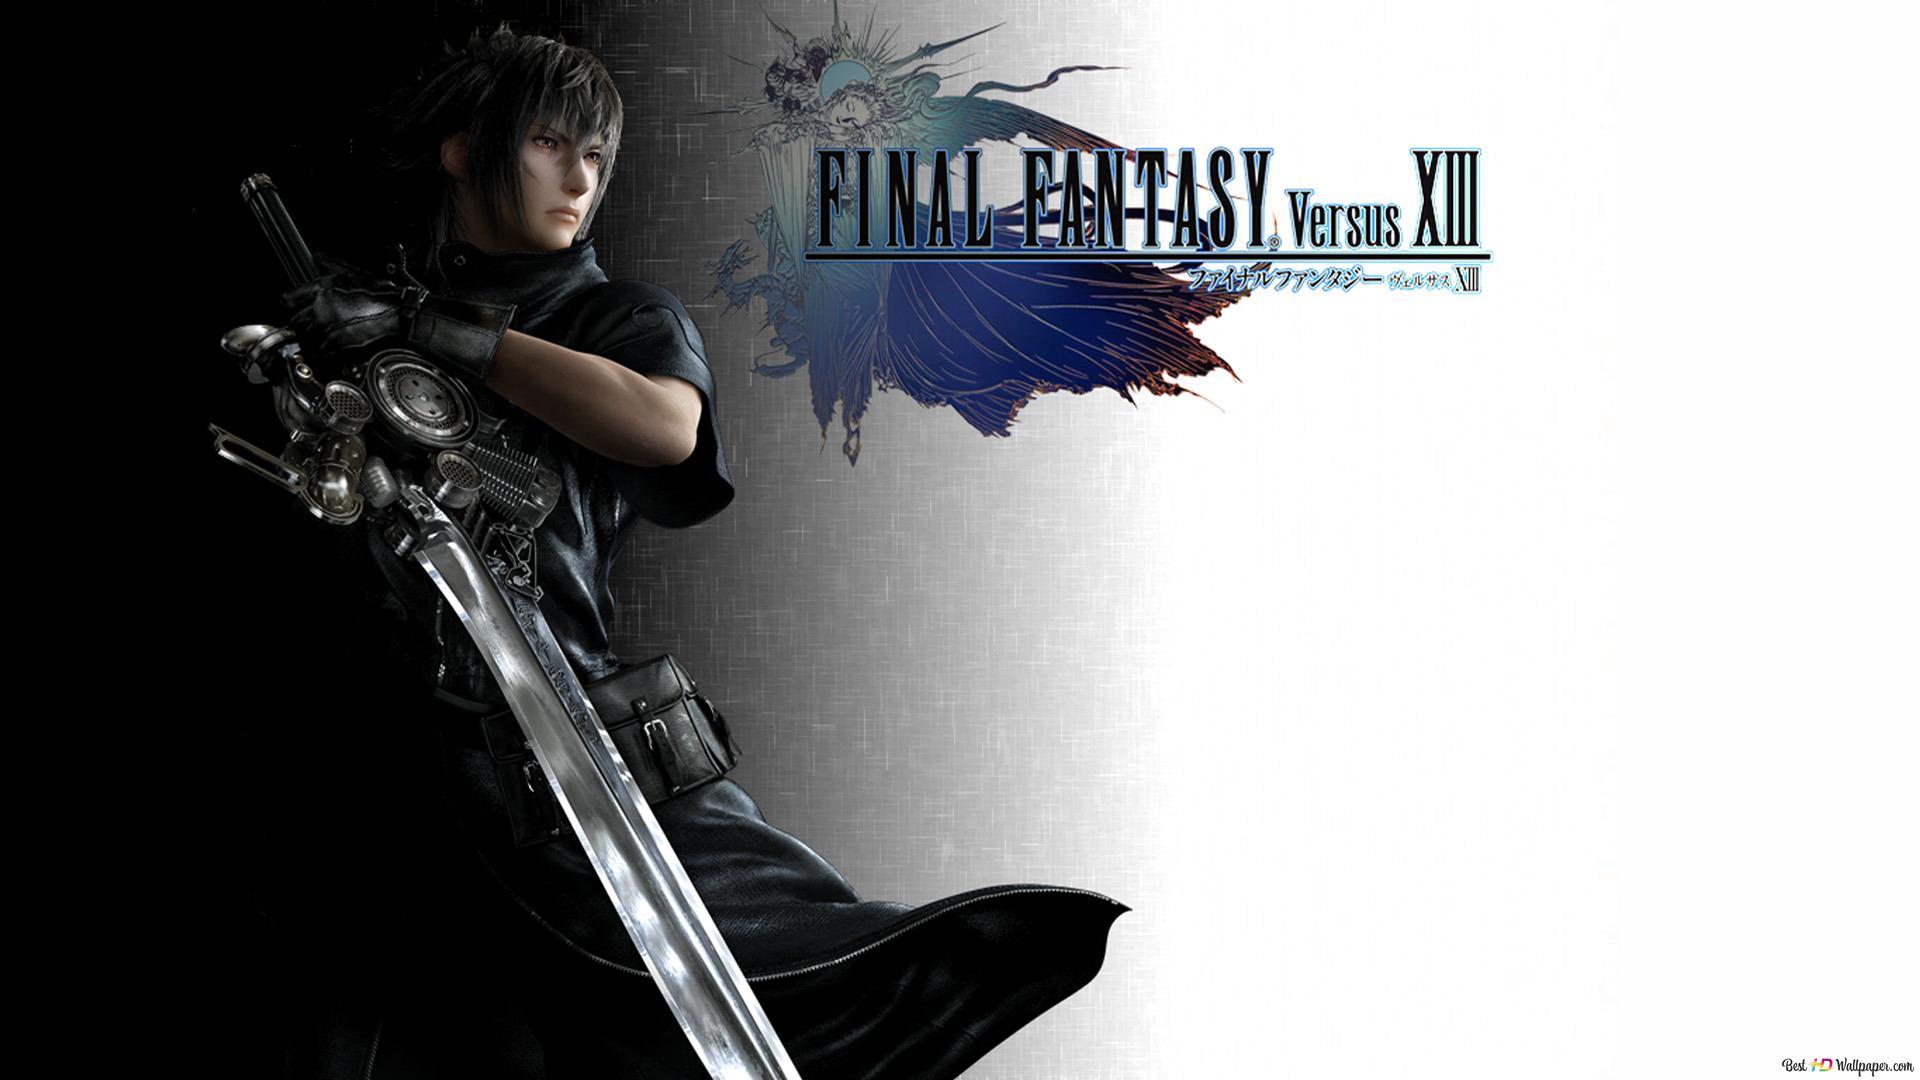 Final Fantasy Versus Xiii Noctis Lucis Caelum Hd Wallpaper Download